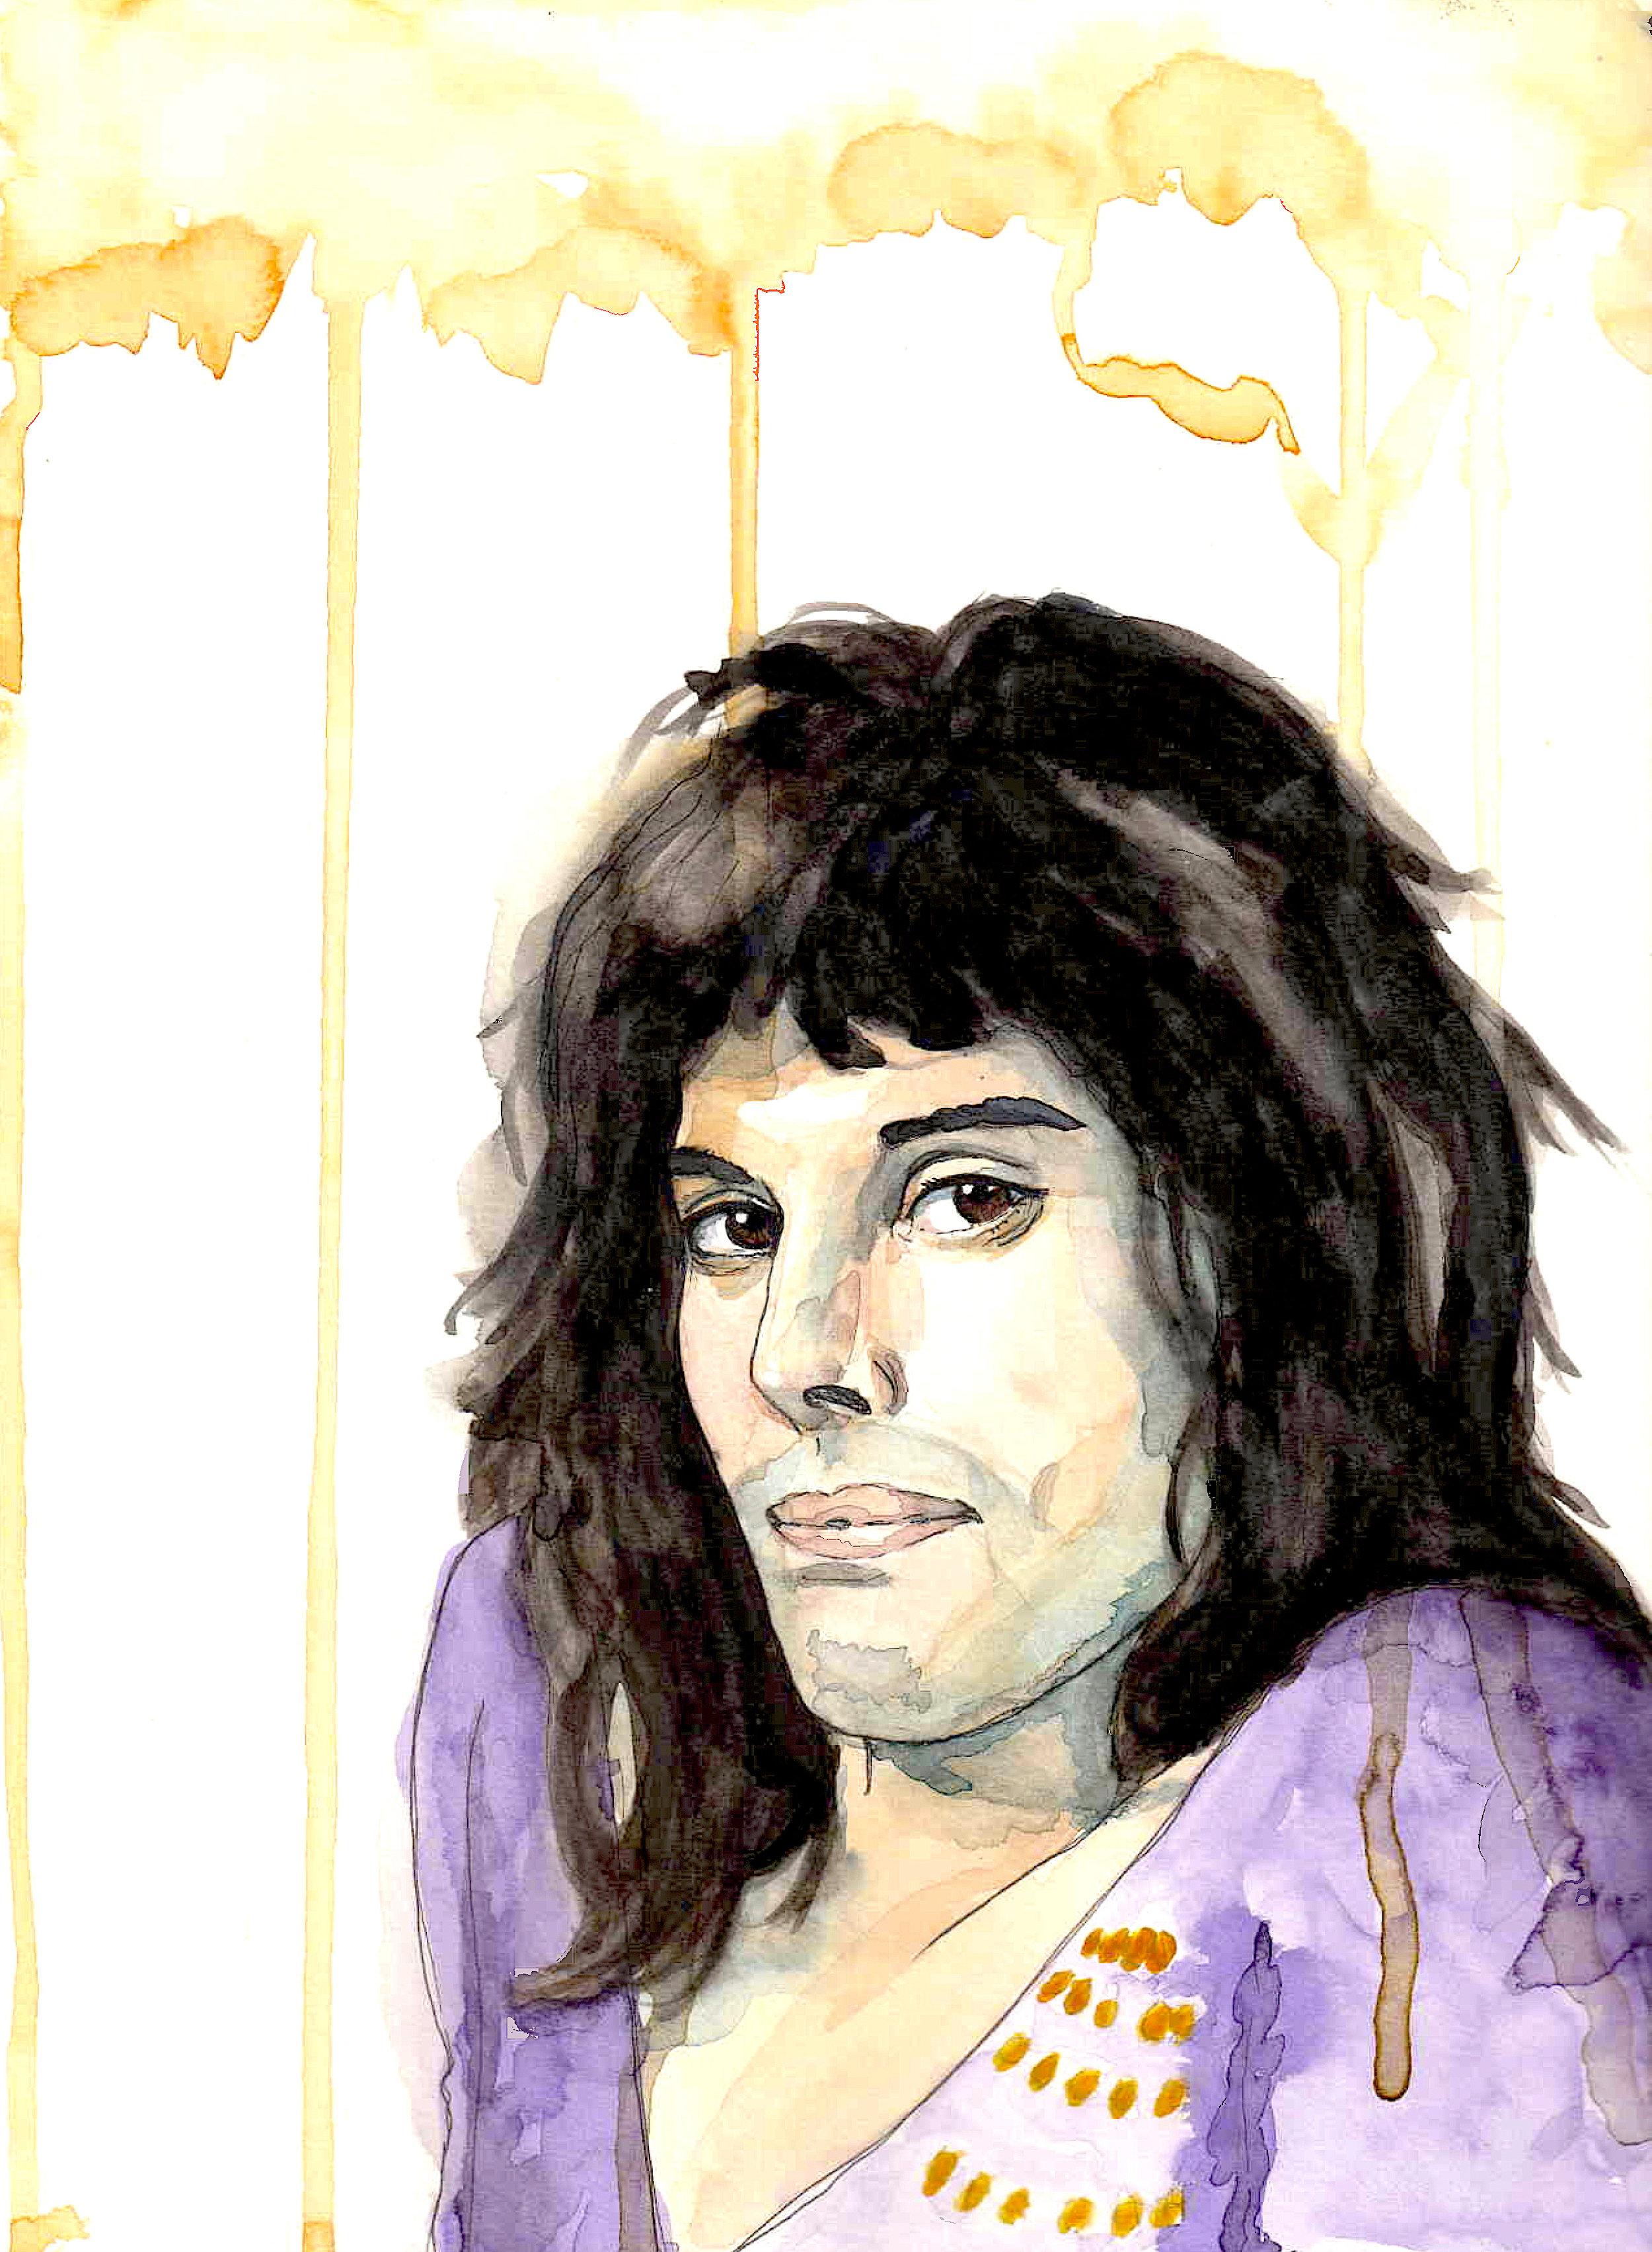 Freddy Mercury glamrock tekening portret inkt en aquarelverf